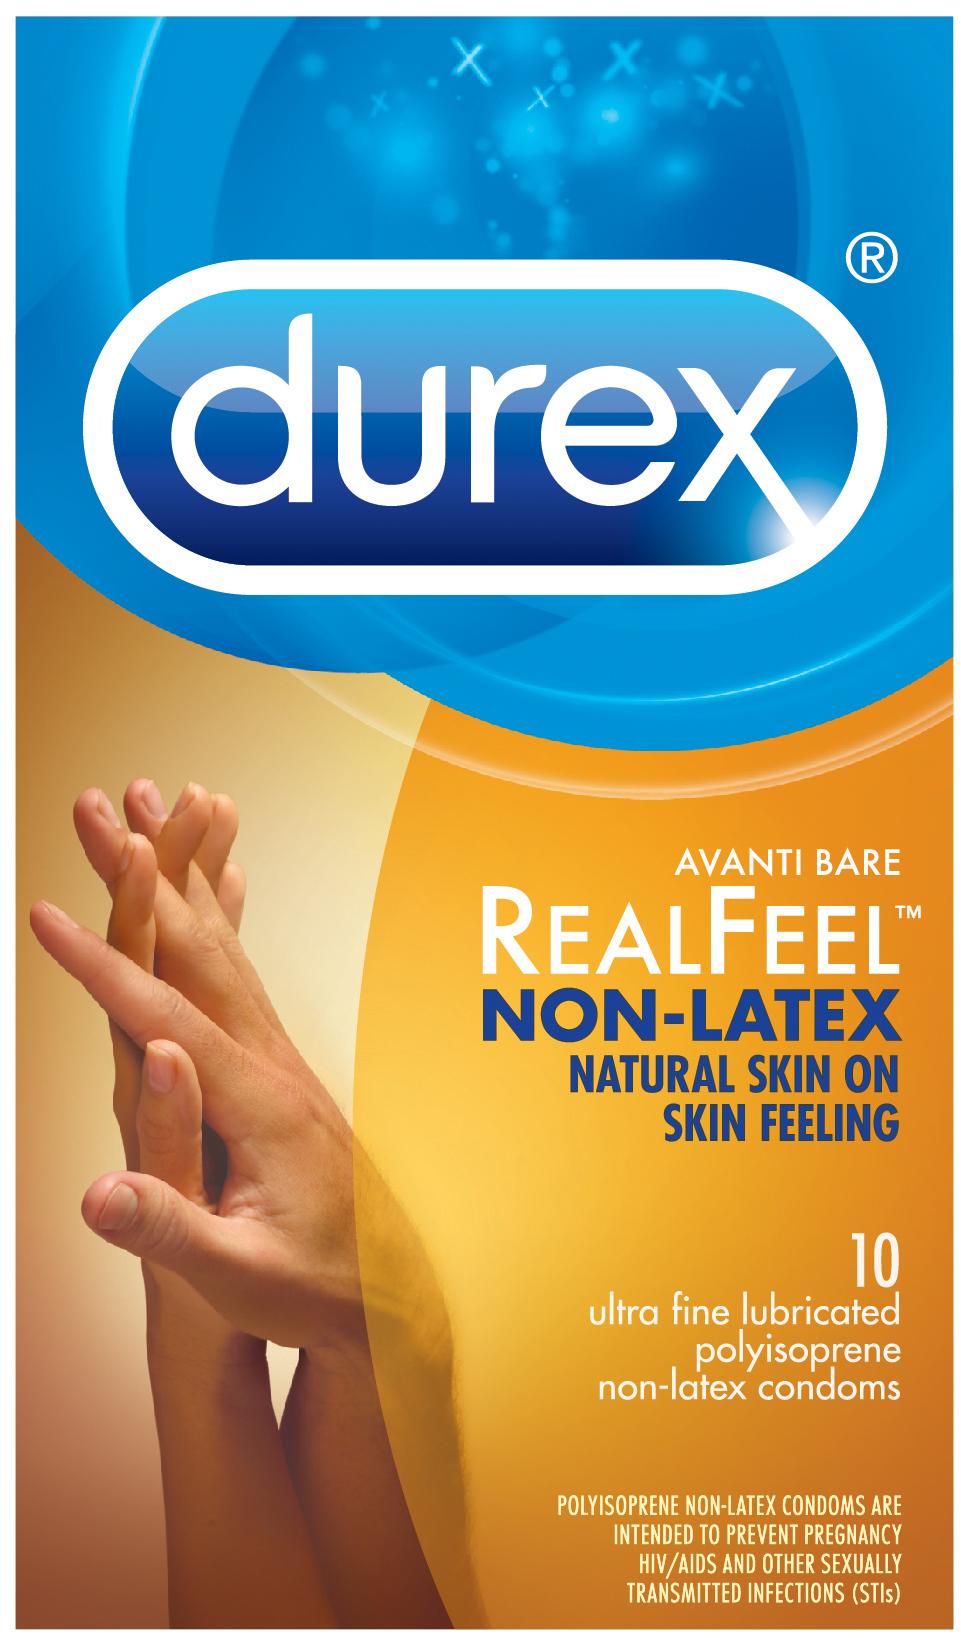 DUREX AVANTI REEL FEEL NON LATEX 10 PACK  - R89456